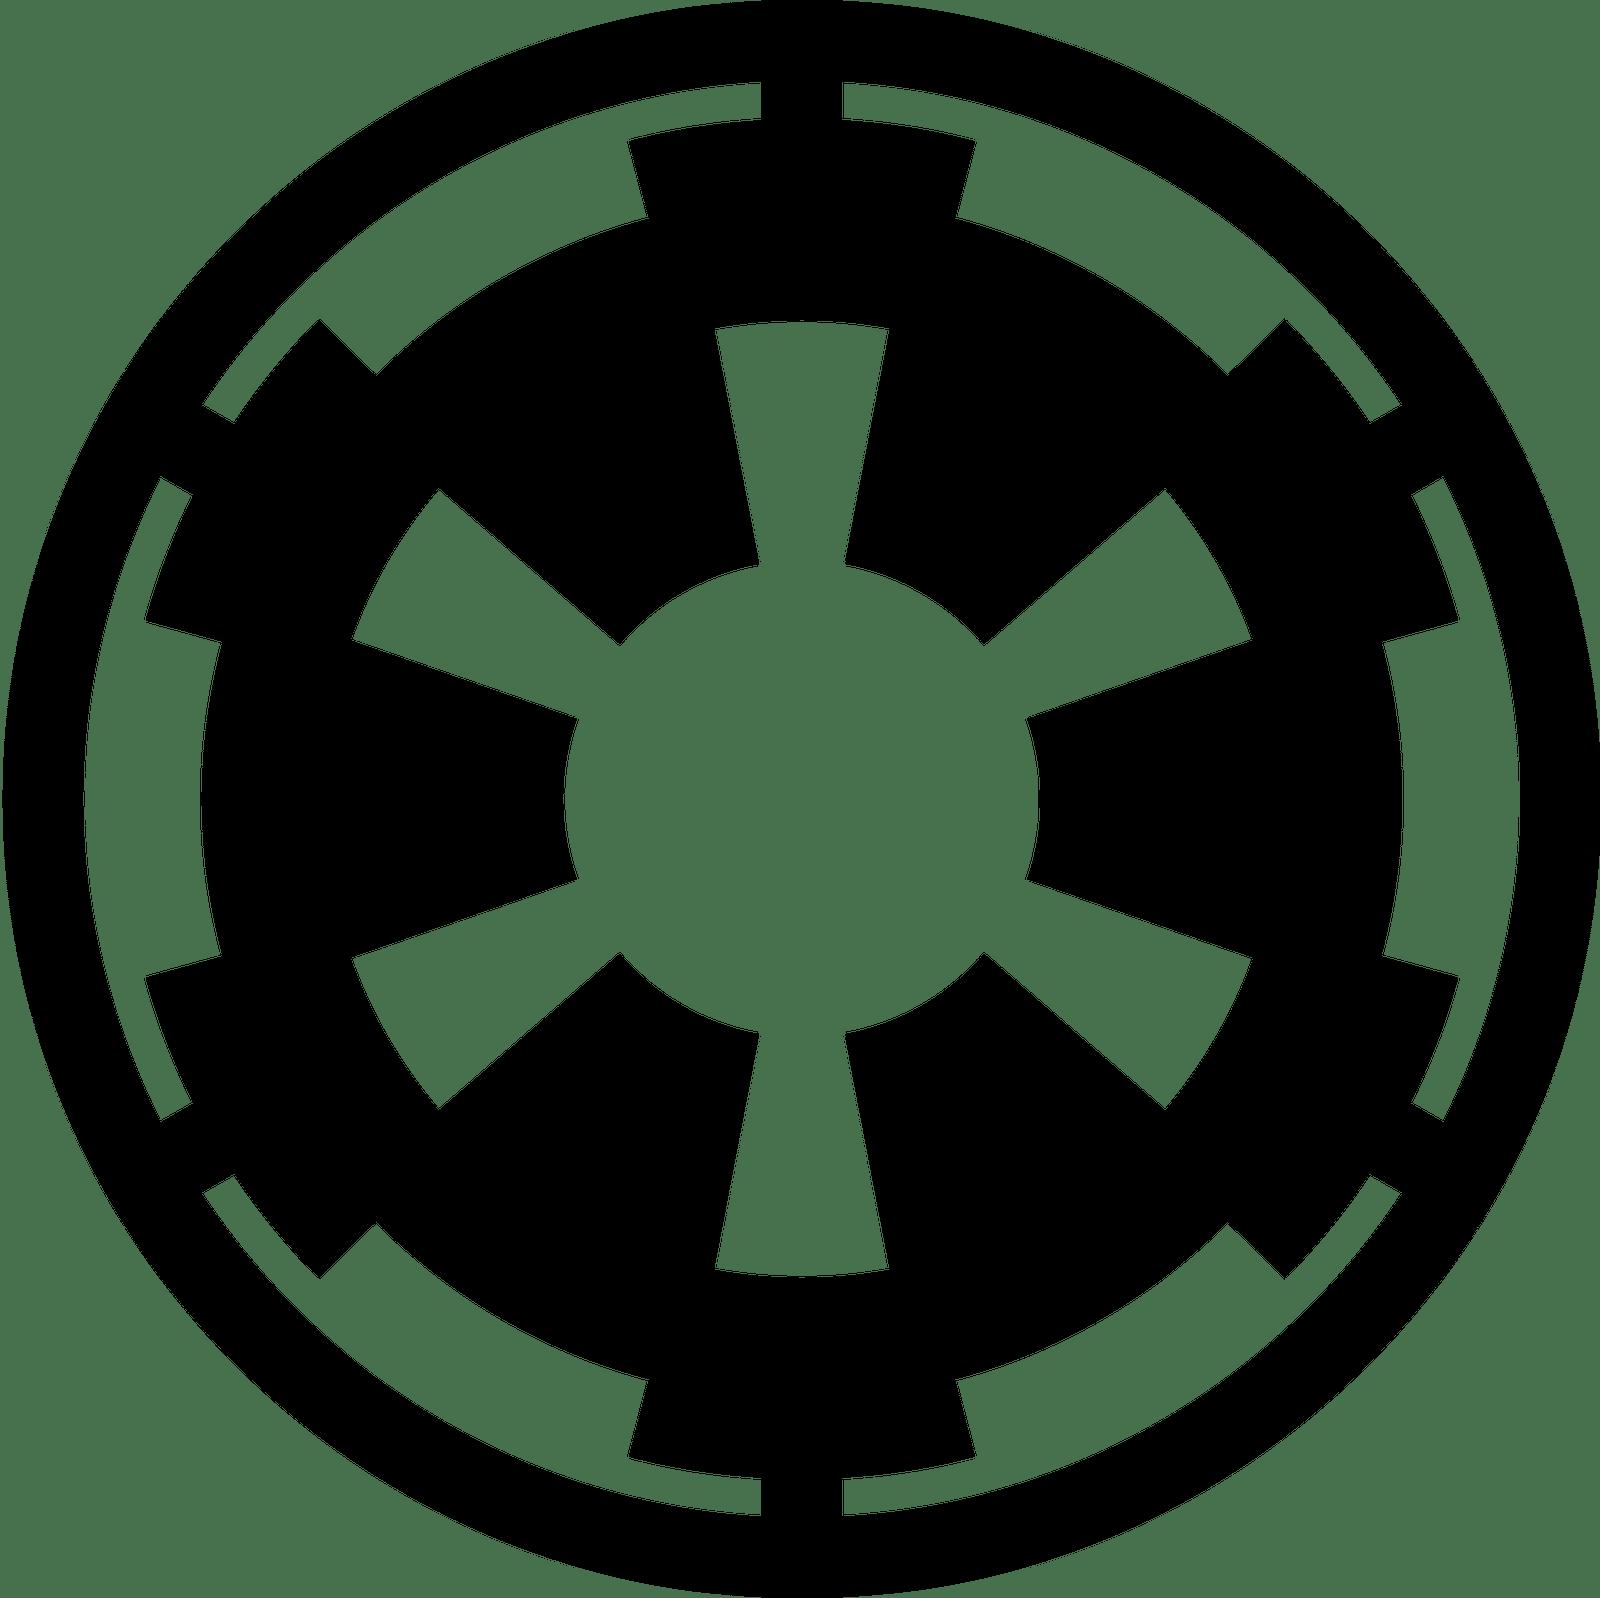 galactic empire symbol Google Search Plastic canvas